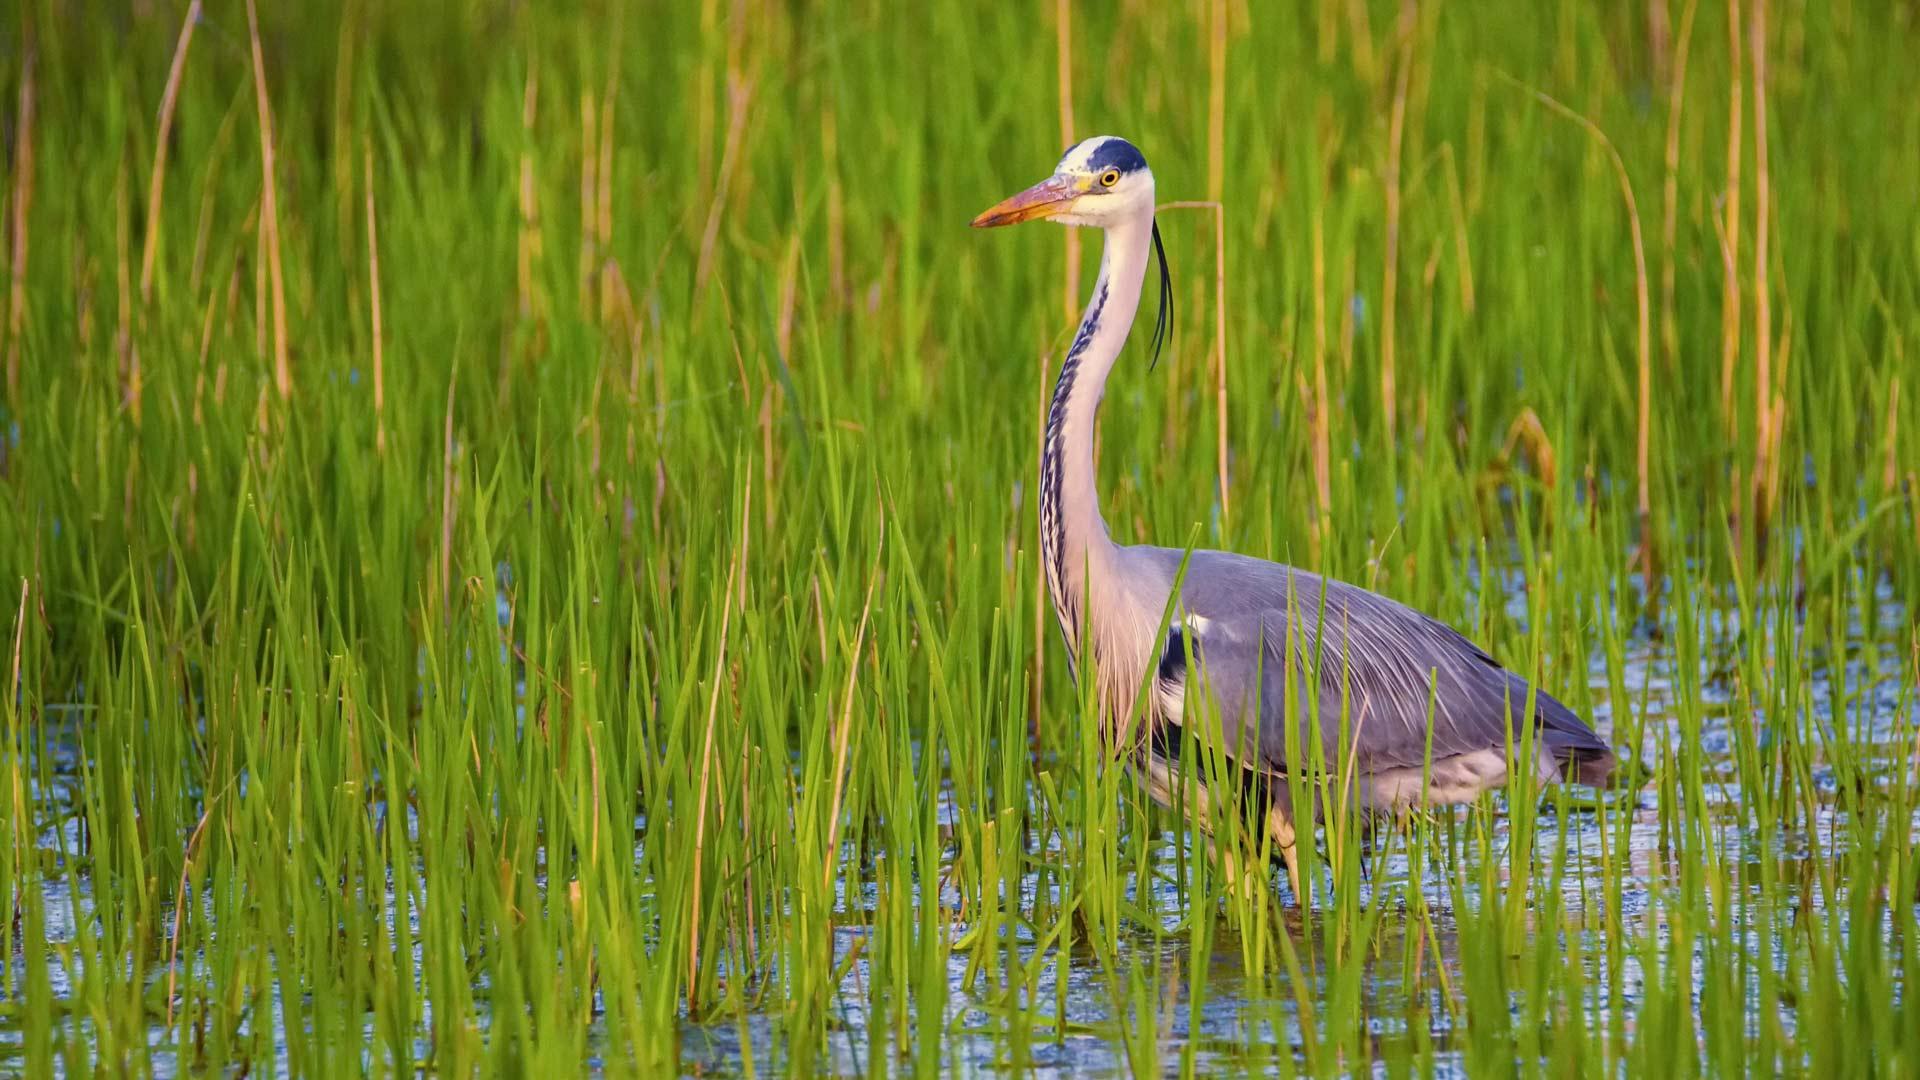 Grey heron, ardea cinerea, in a water among grass